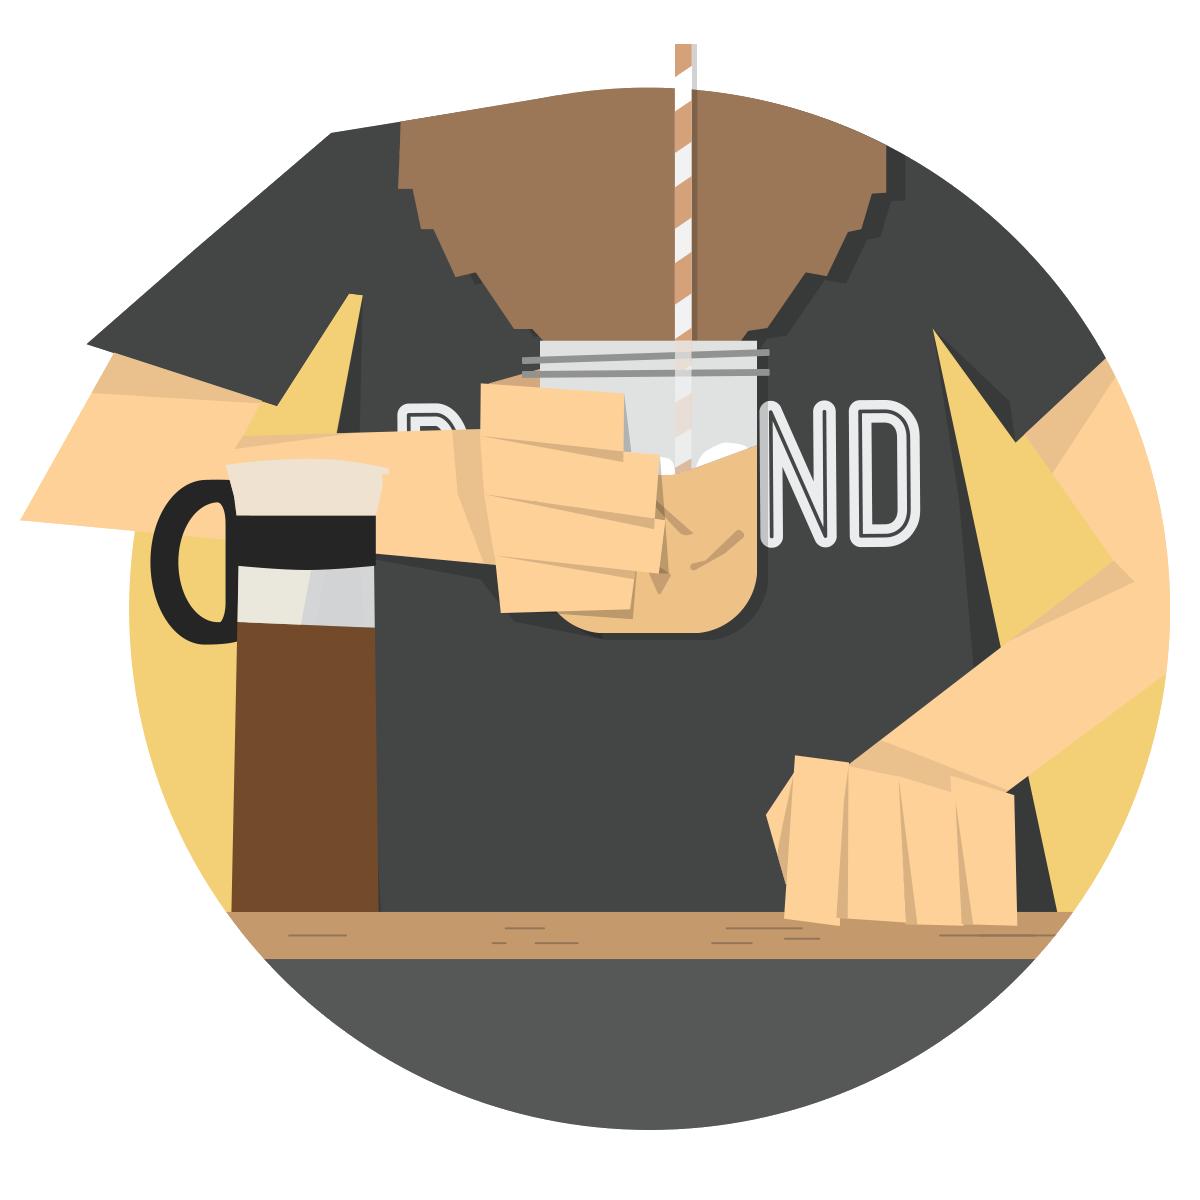 The Iced Coffee Aficionado